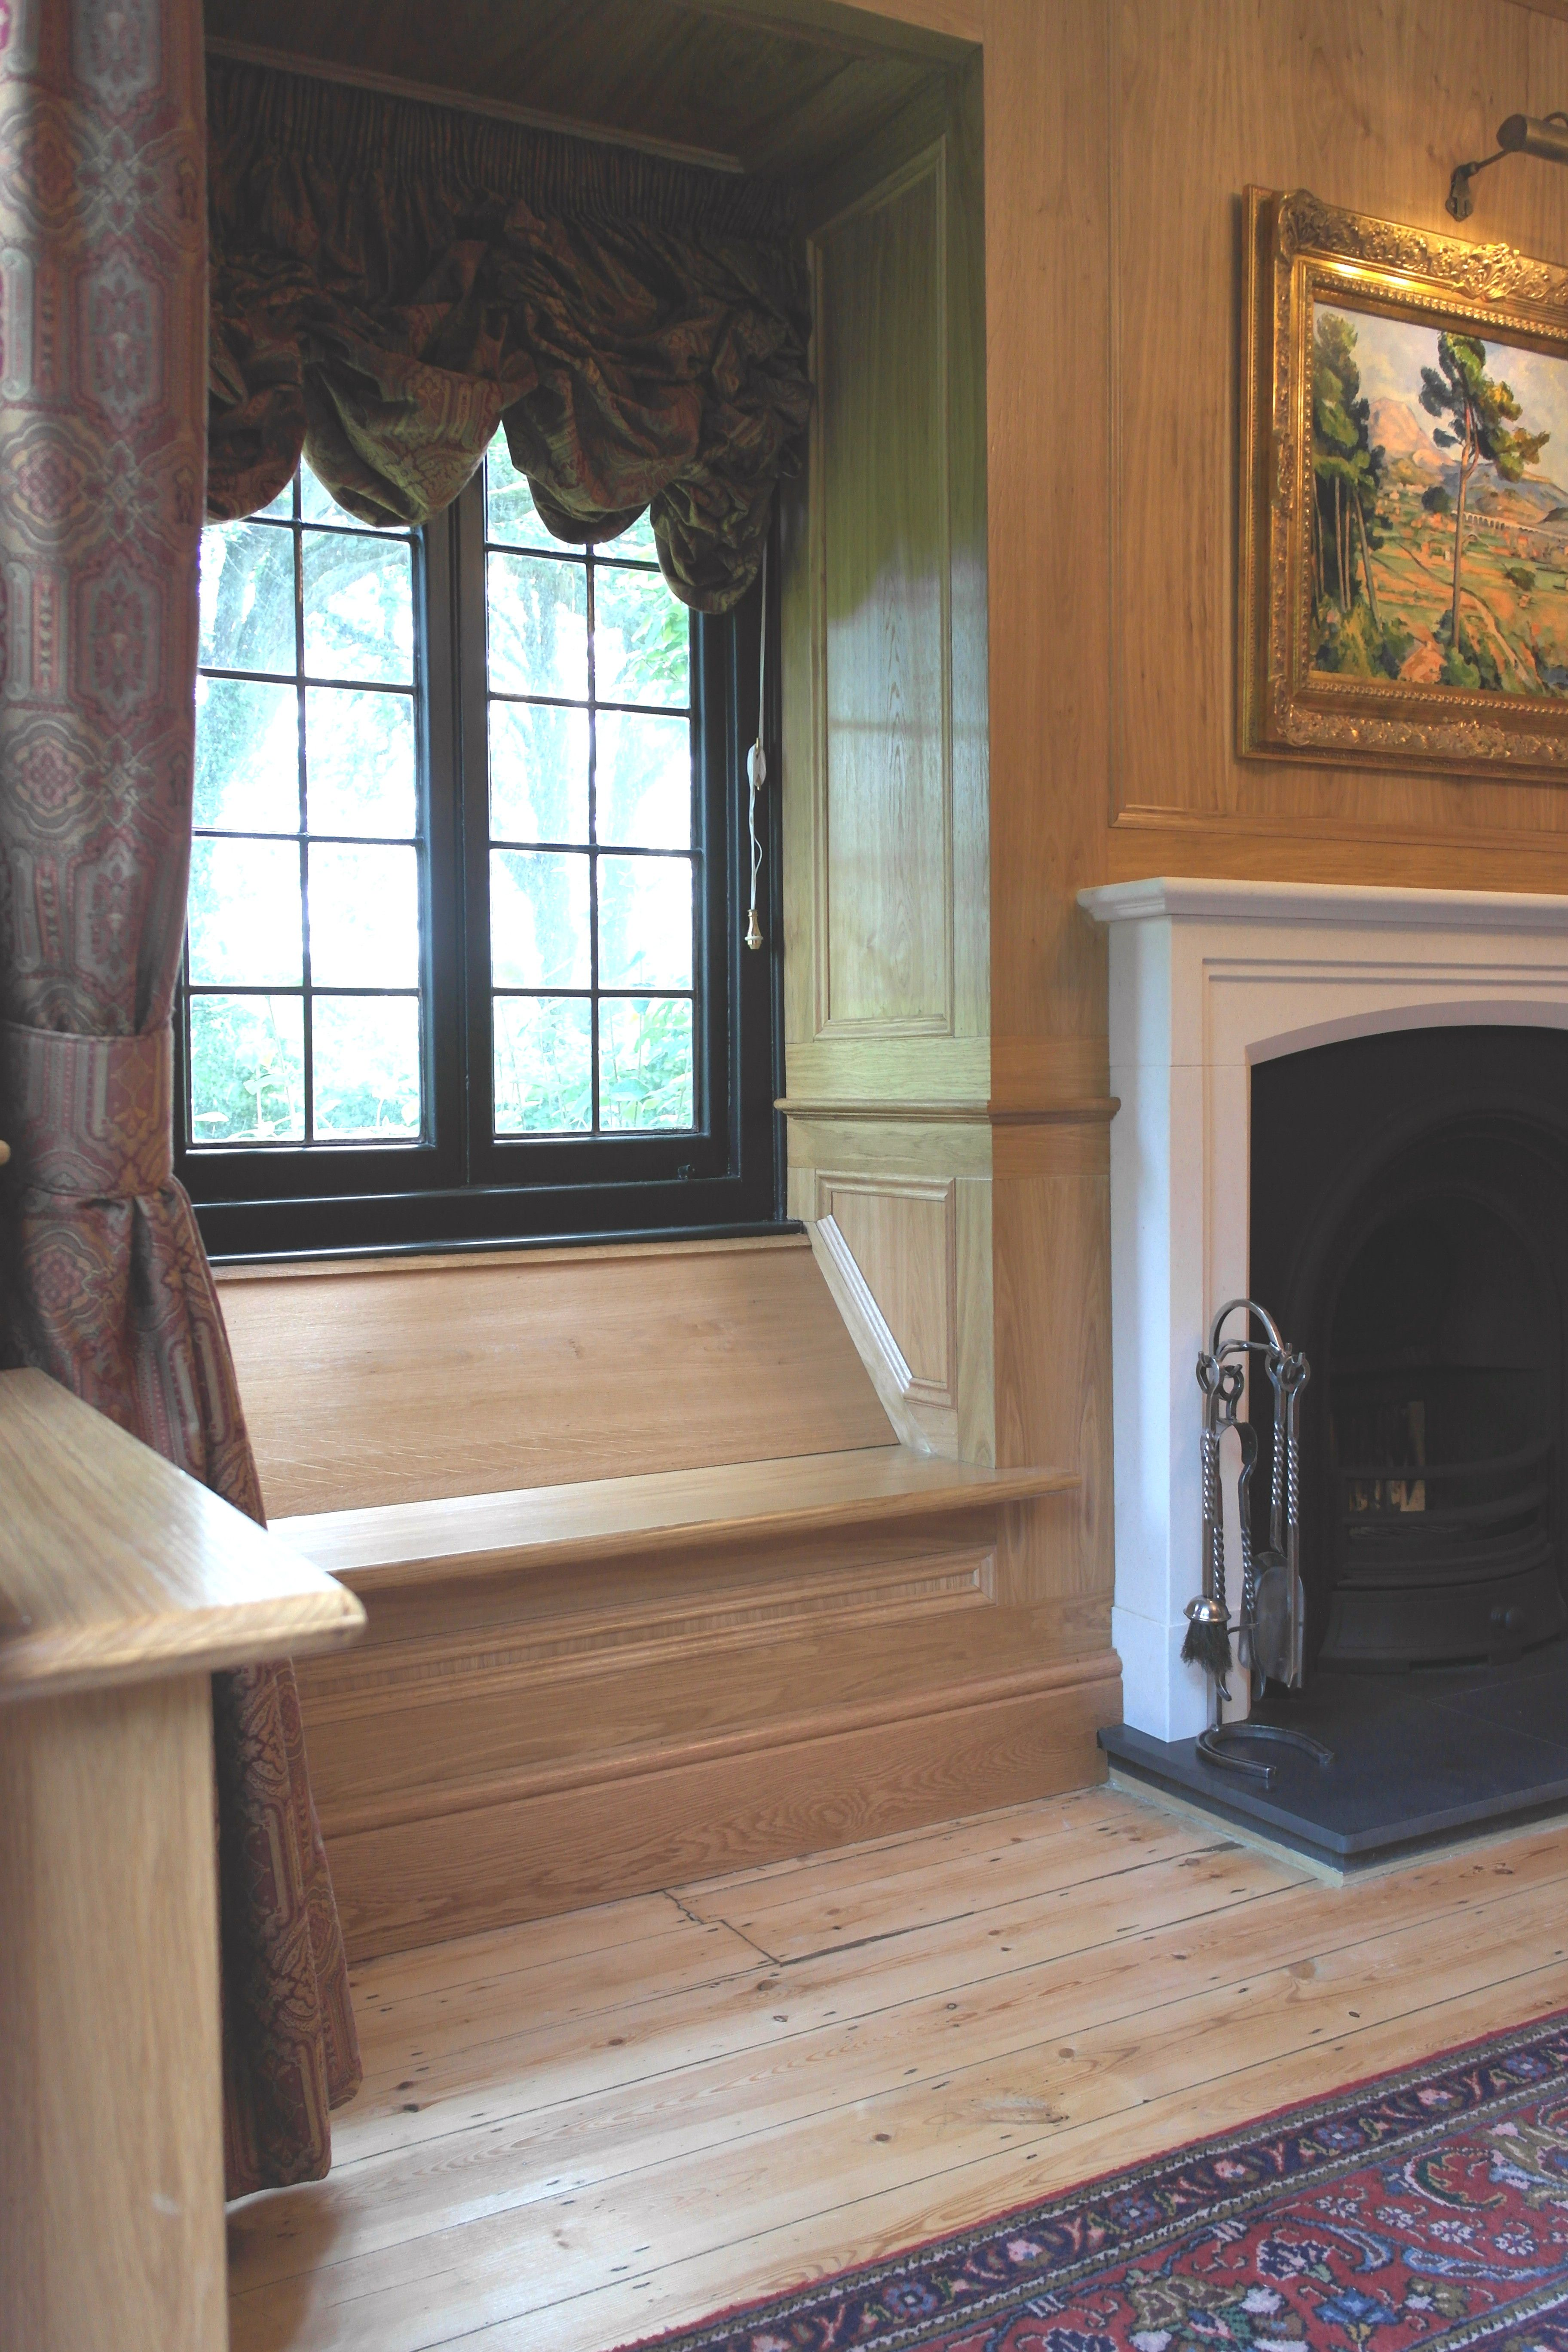 Oak Paneled Room: Traditional Oak Panelled Room